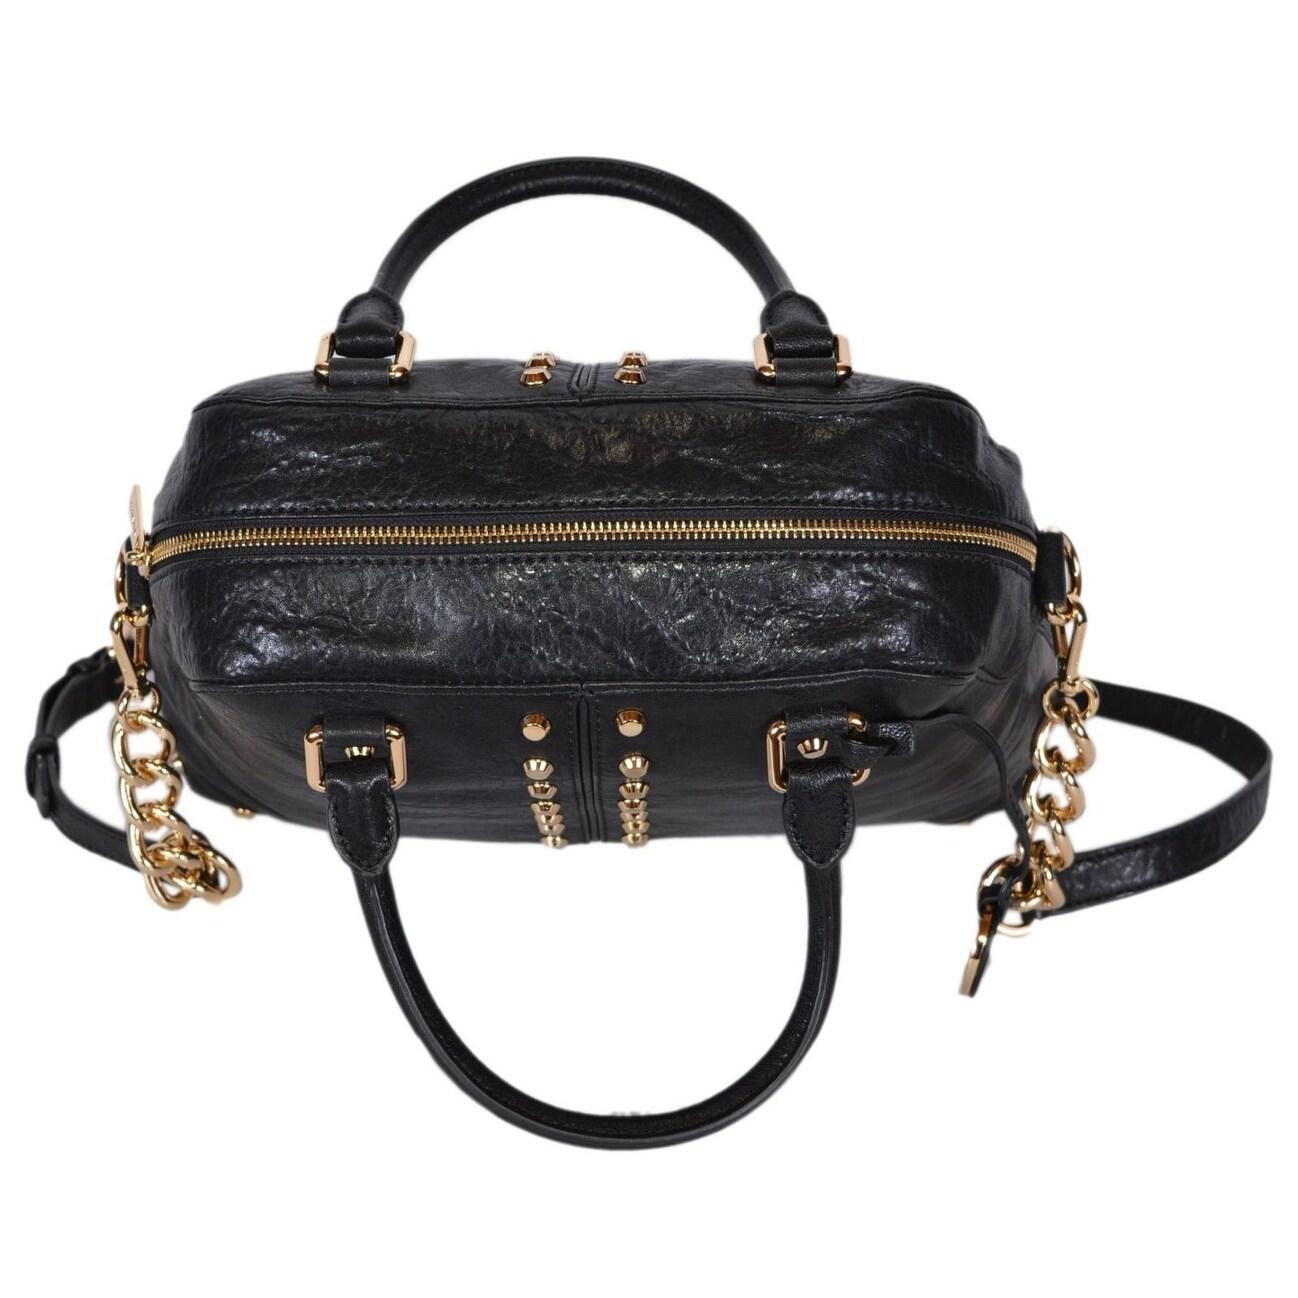 ebe02d7e7204 ... Studded Uptown Satchel Bag Shop Michael Kors Large Black Leather Uptown  Astor Convertible Dome Handbag - 14.25